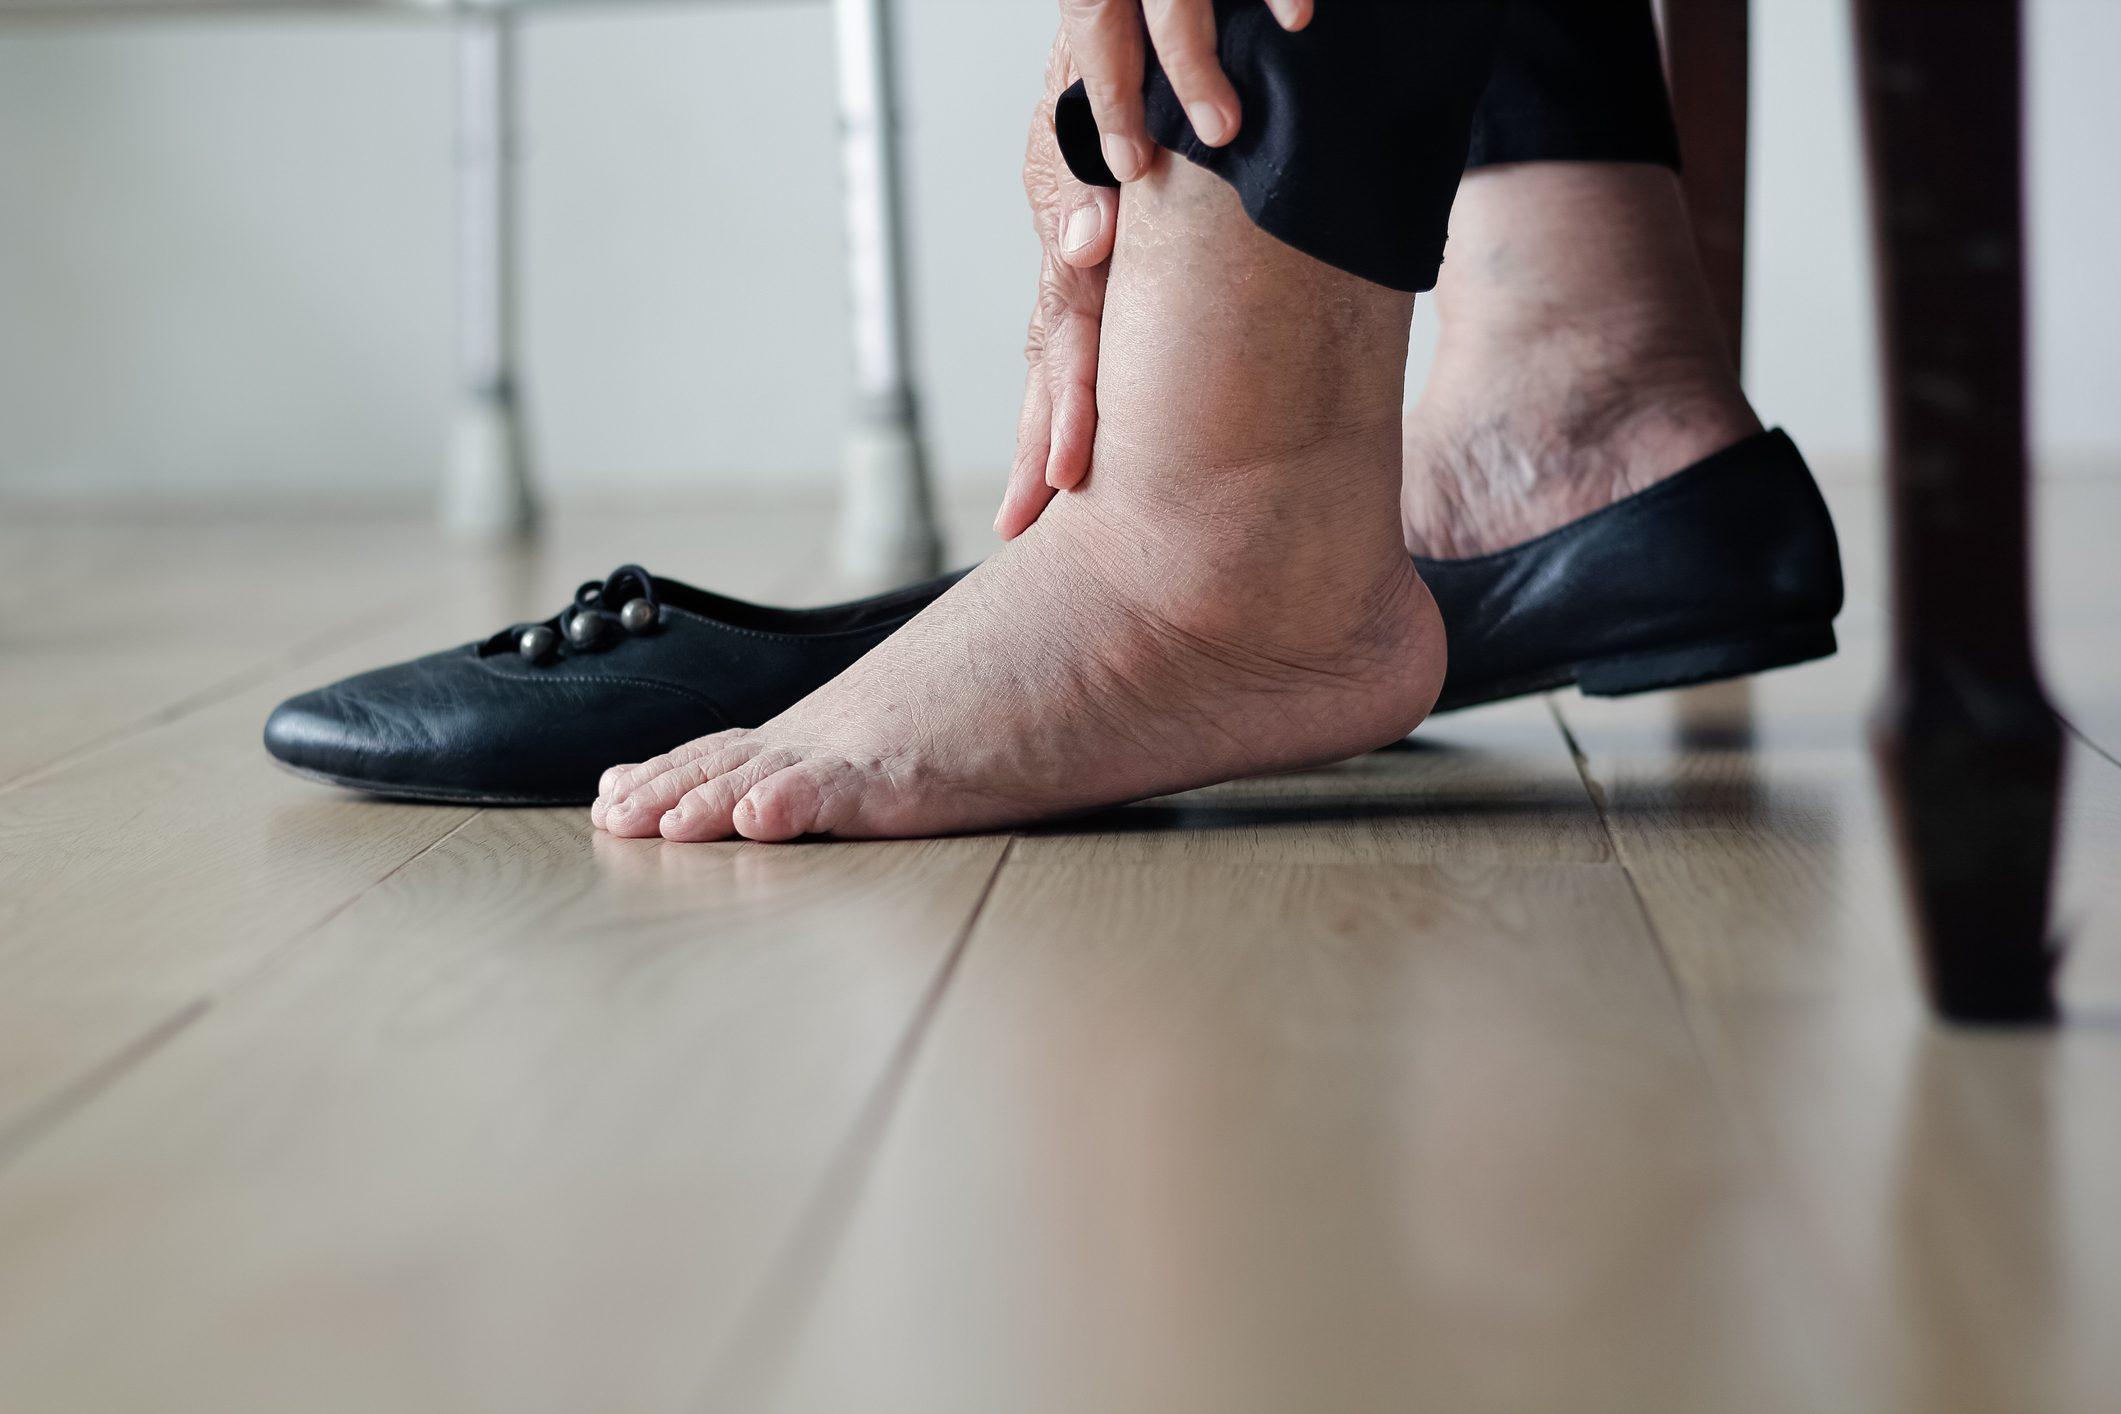 Caviglie gonfie: sintomi, cause e rimedi | Ohga!